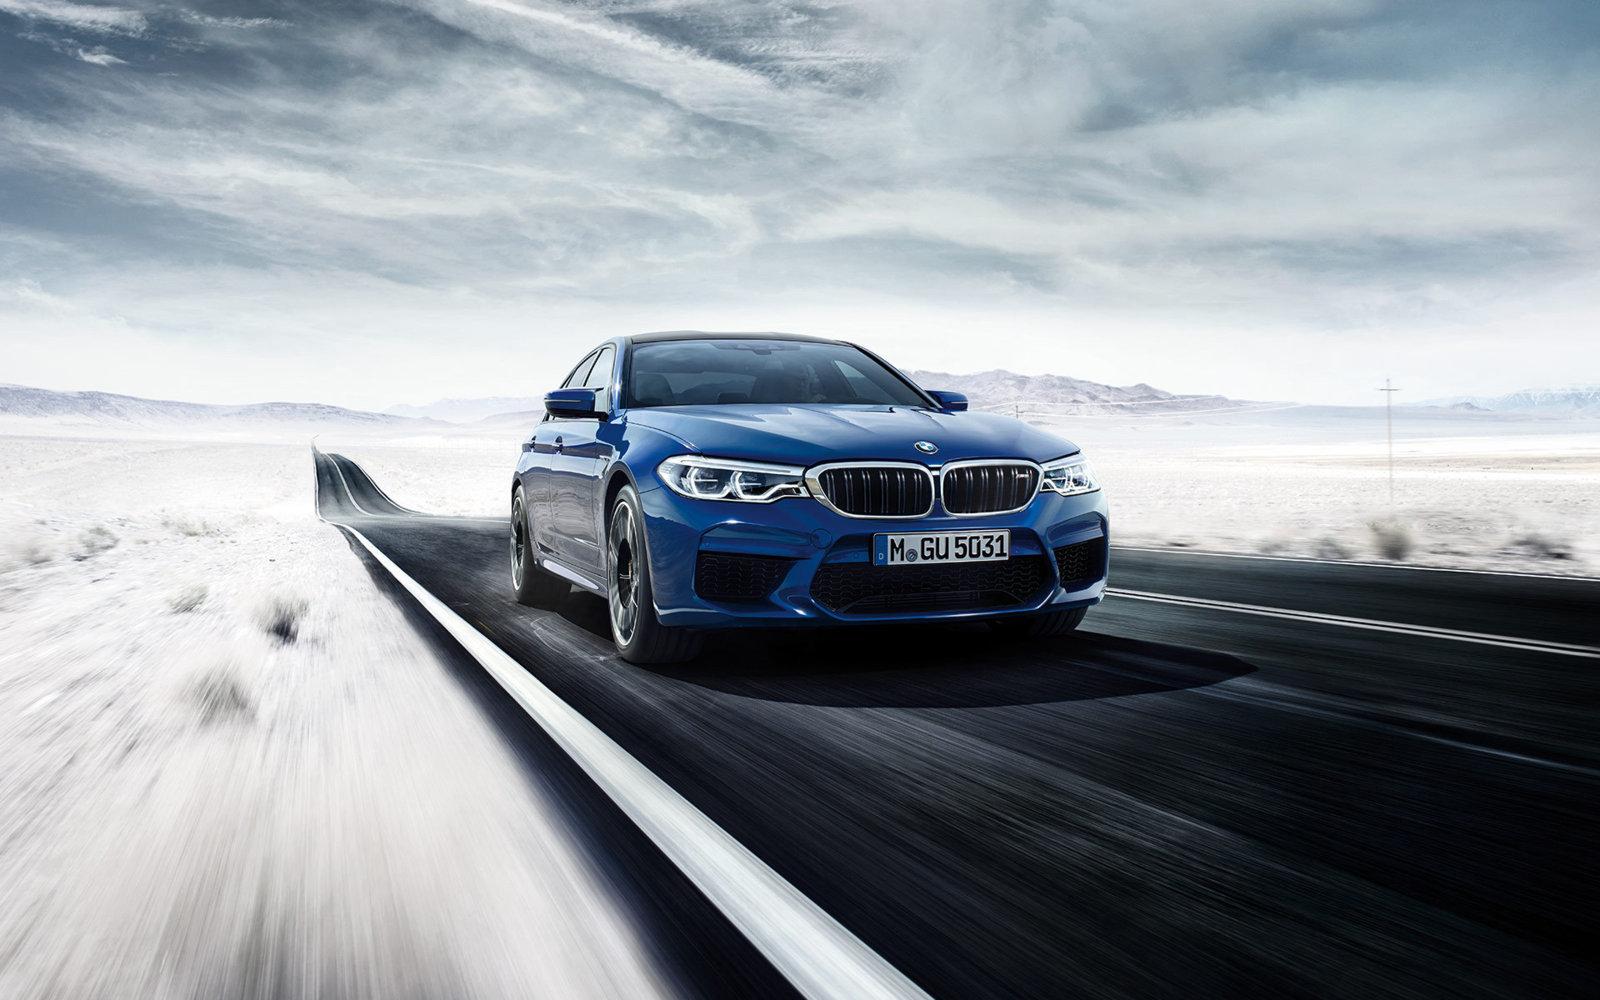 BMW-M5-2018-Wallpaper-3.jpg